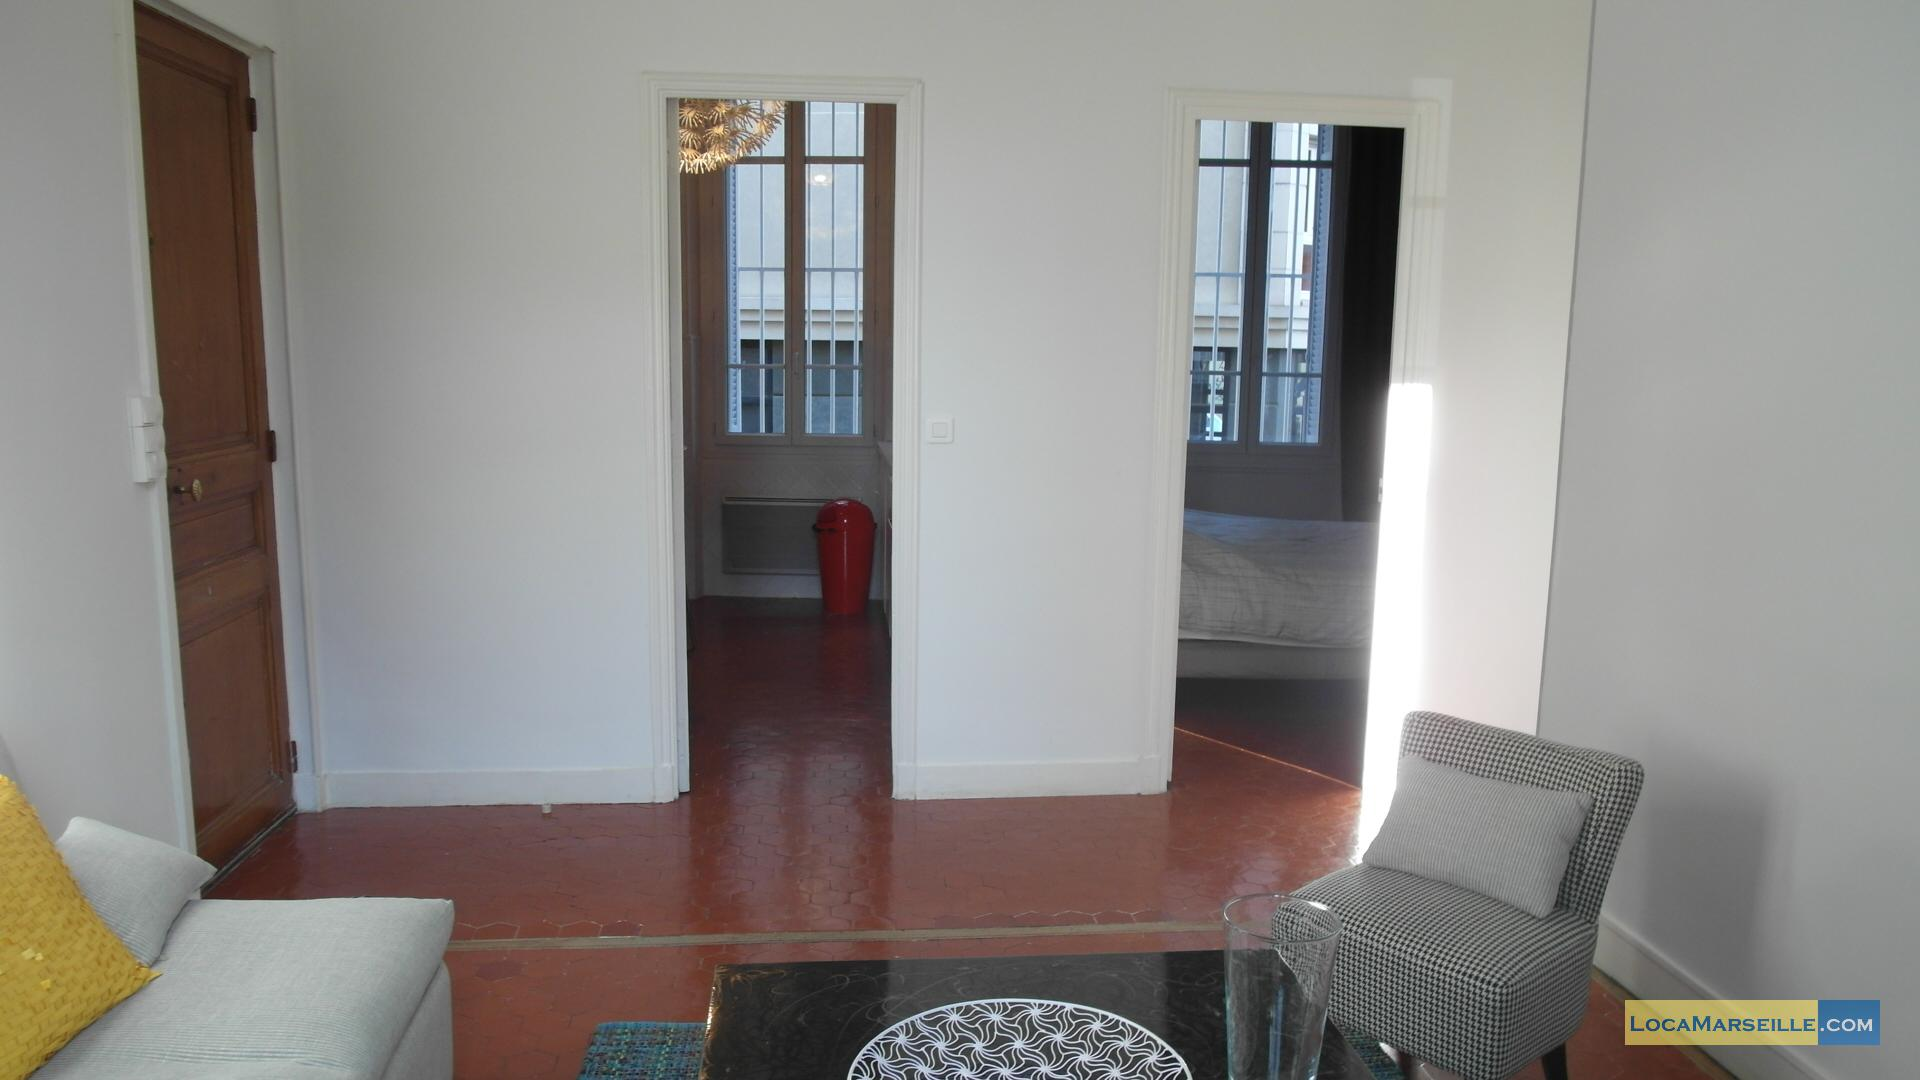 Location meubl e marseille proche du prado et de castellane for Location appartement design